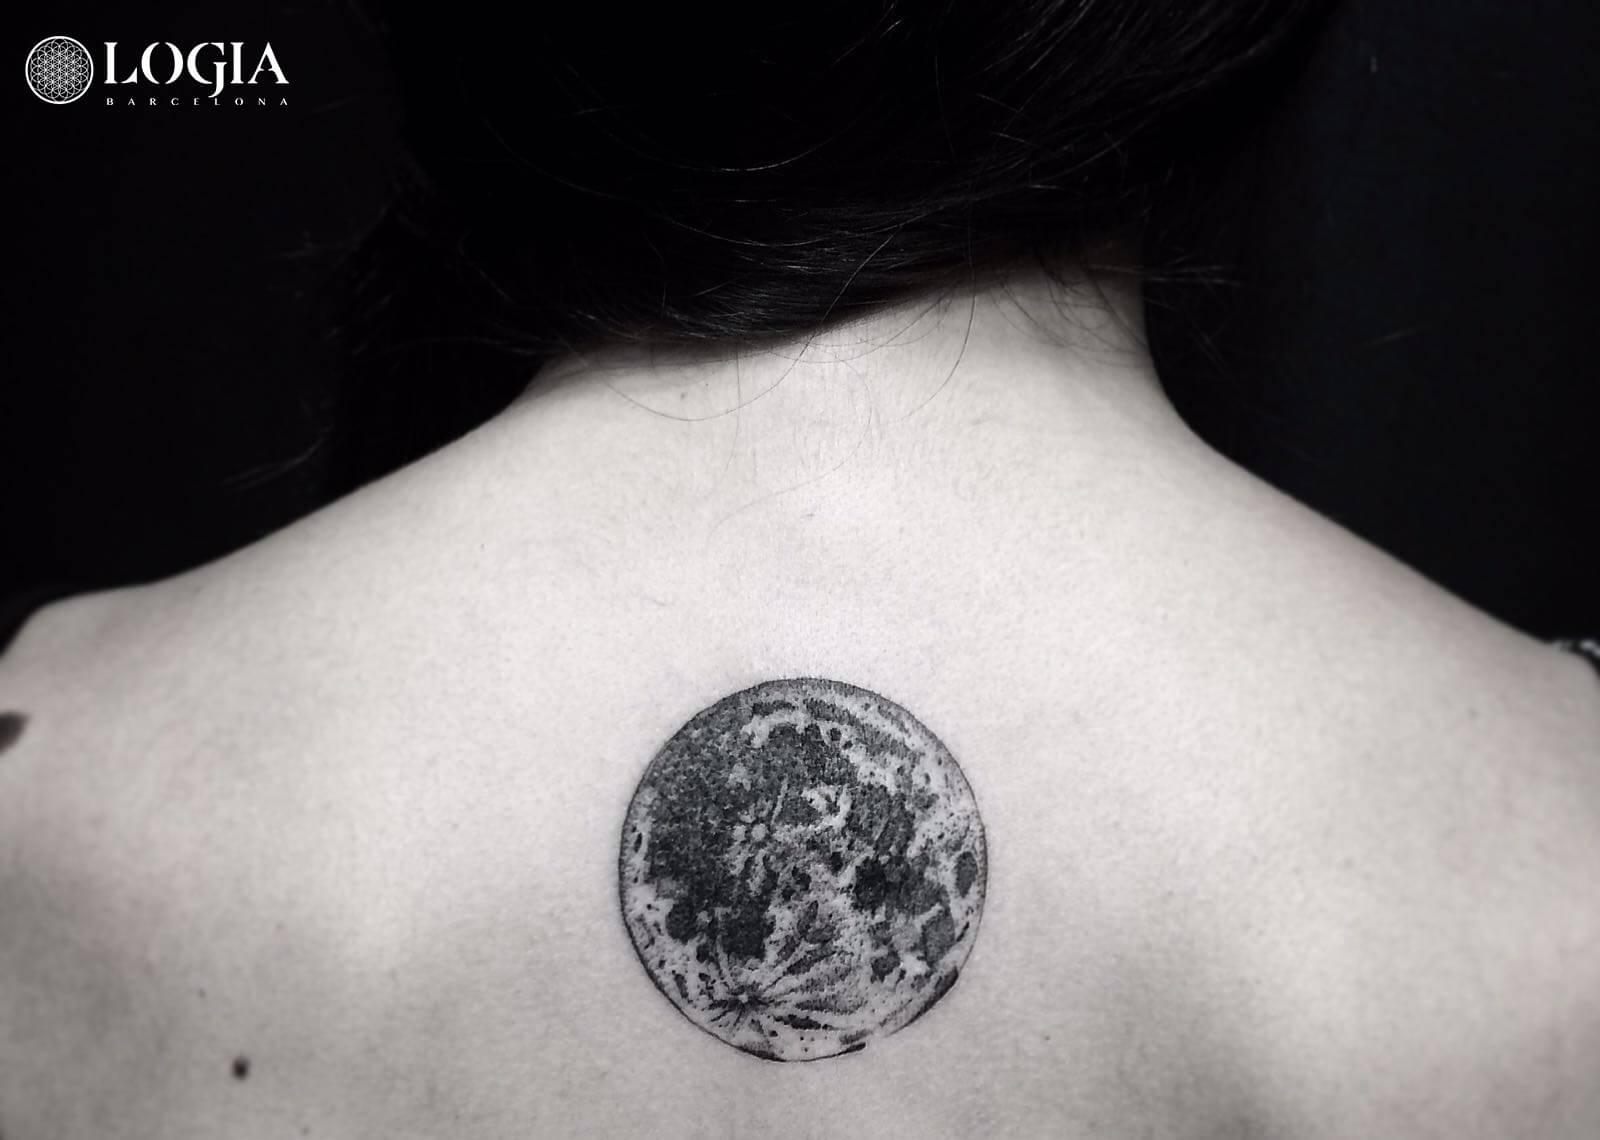 Los Tatuajes De Luna Que No Puedes Perderte Tatuajes Logia Barcelona